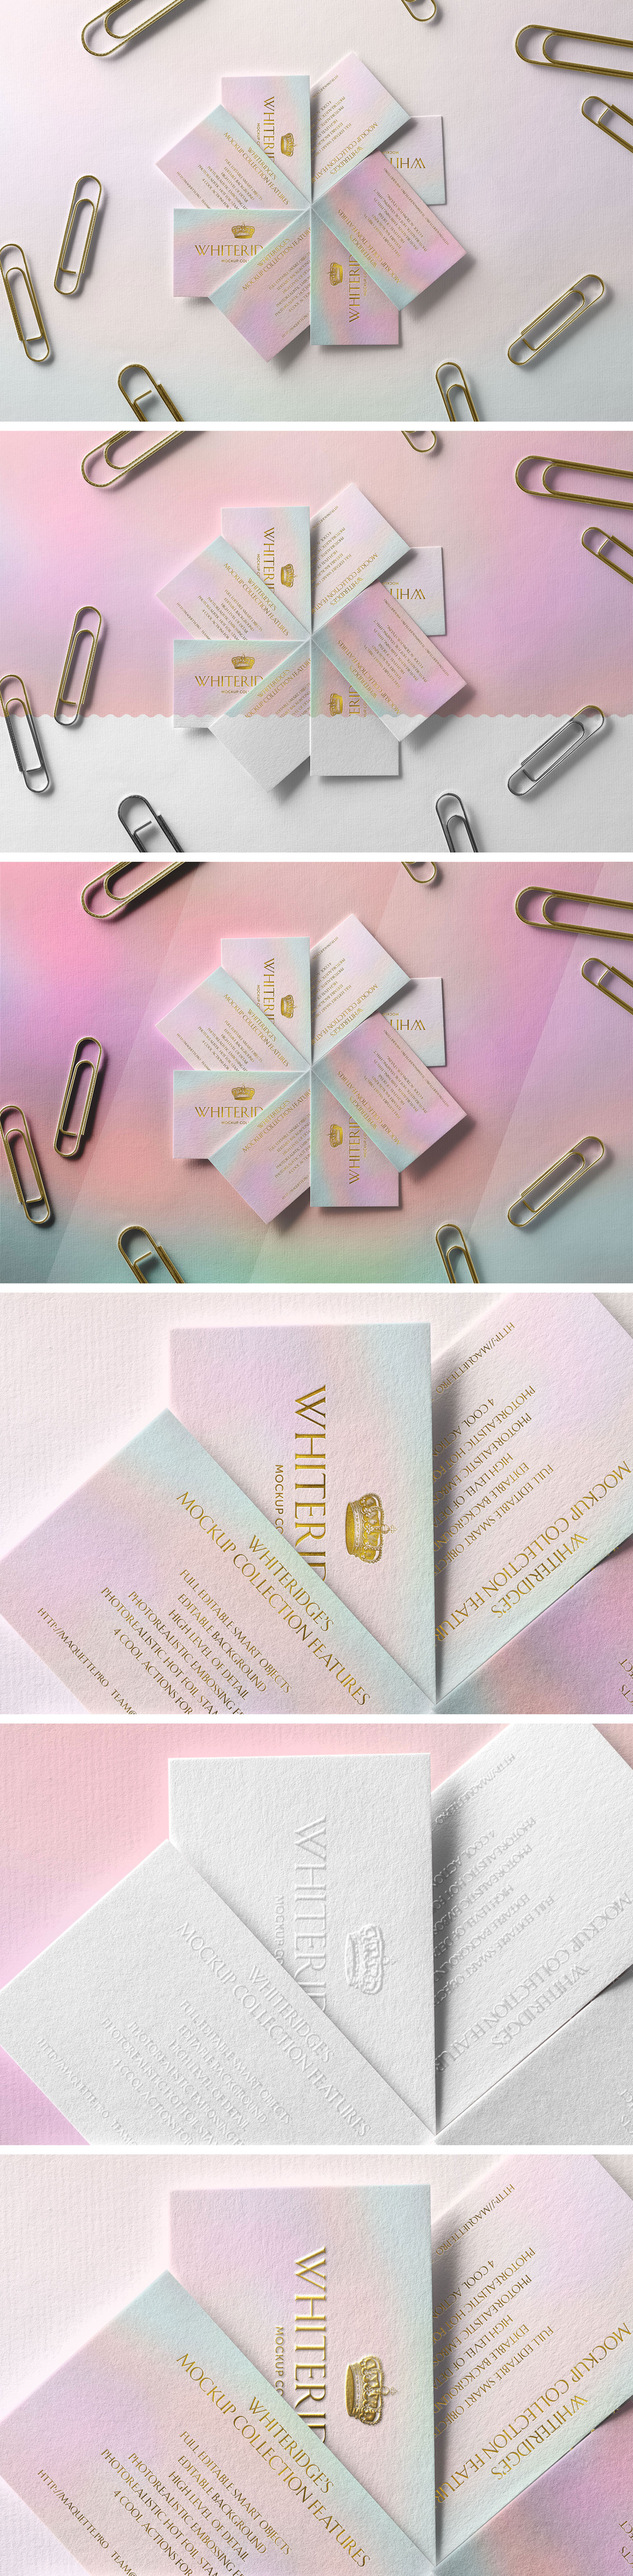 金色浮雕效果图名片设计样机模板 Fan of Luxury Business Cards with Gold Embossing Mockup 1插图